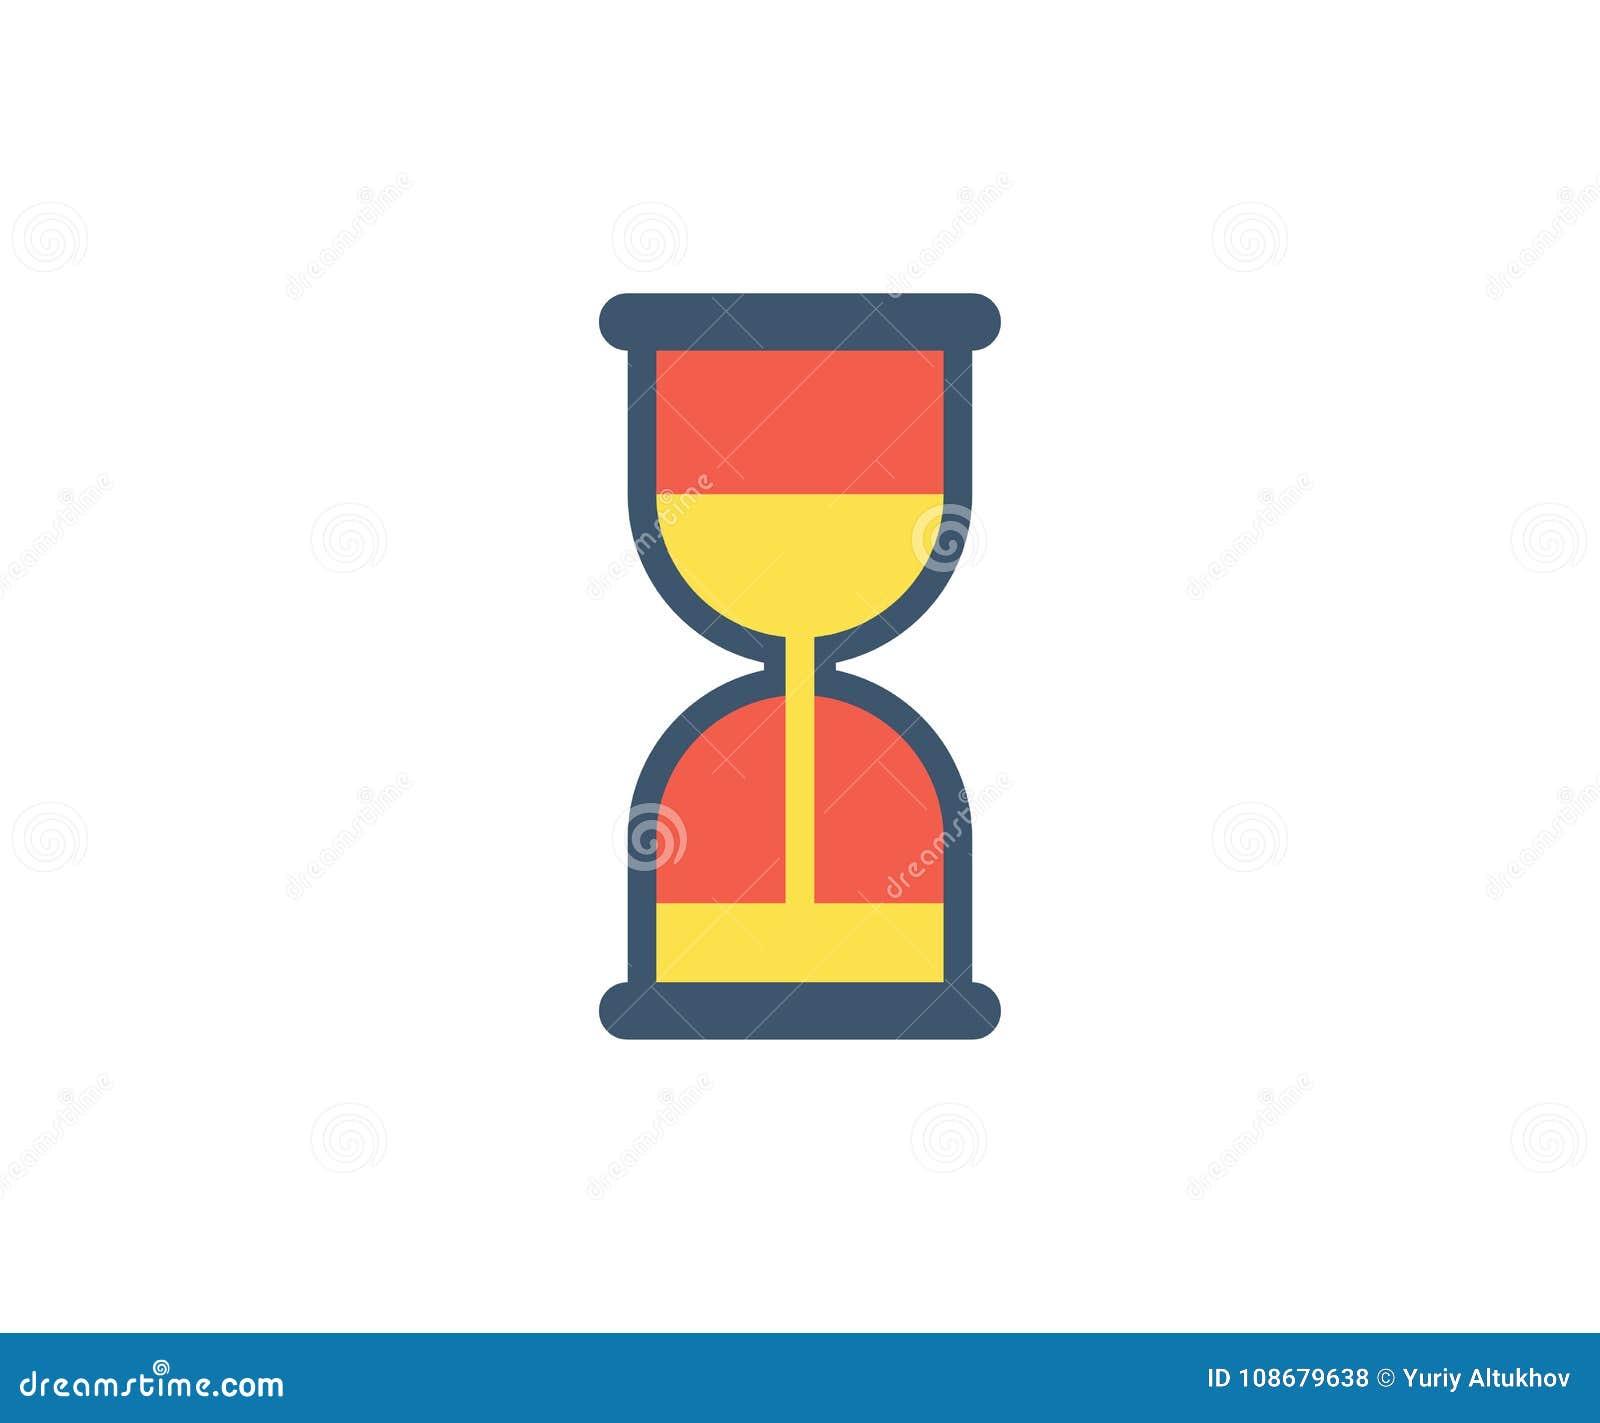 dfa78b24bb8 Hourglass Icon. Vector Illustration In Flat Minimalist Style Stock ...